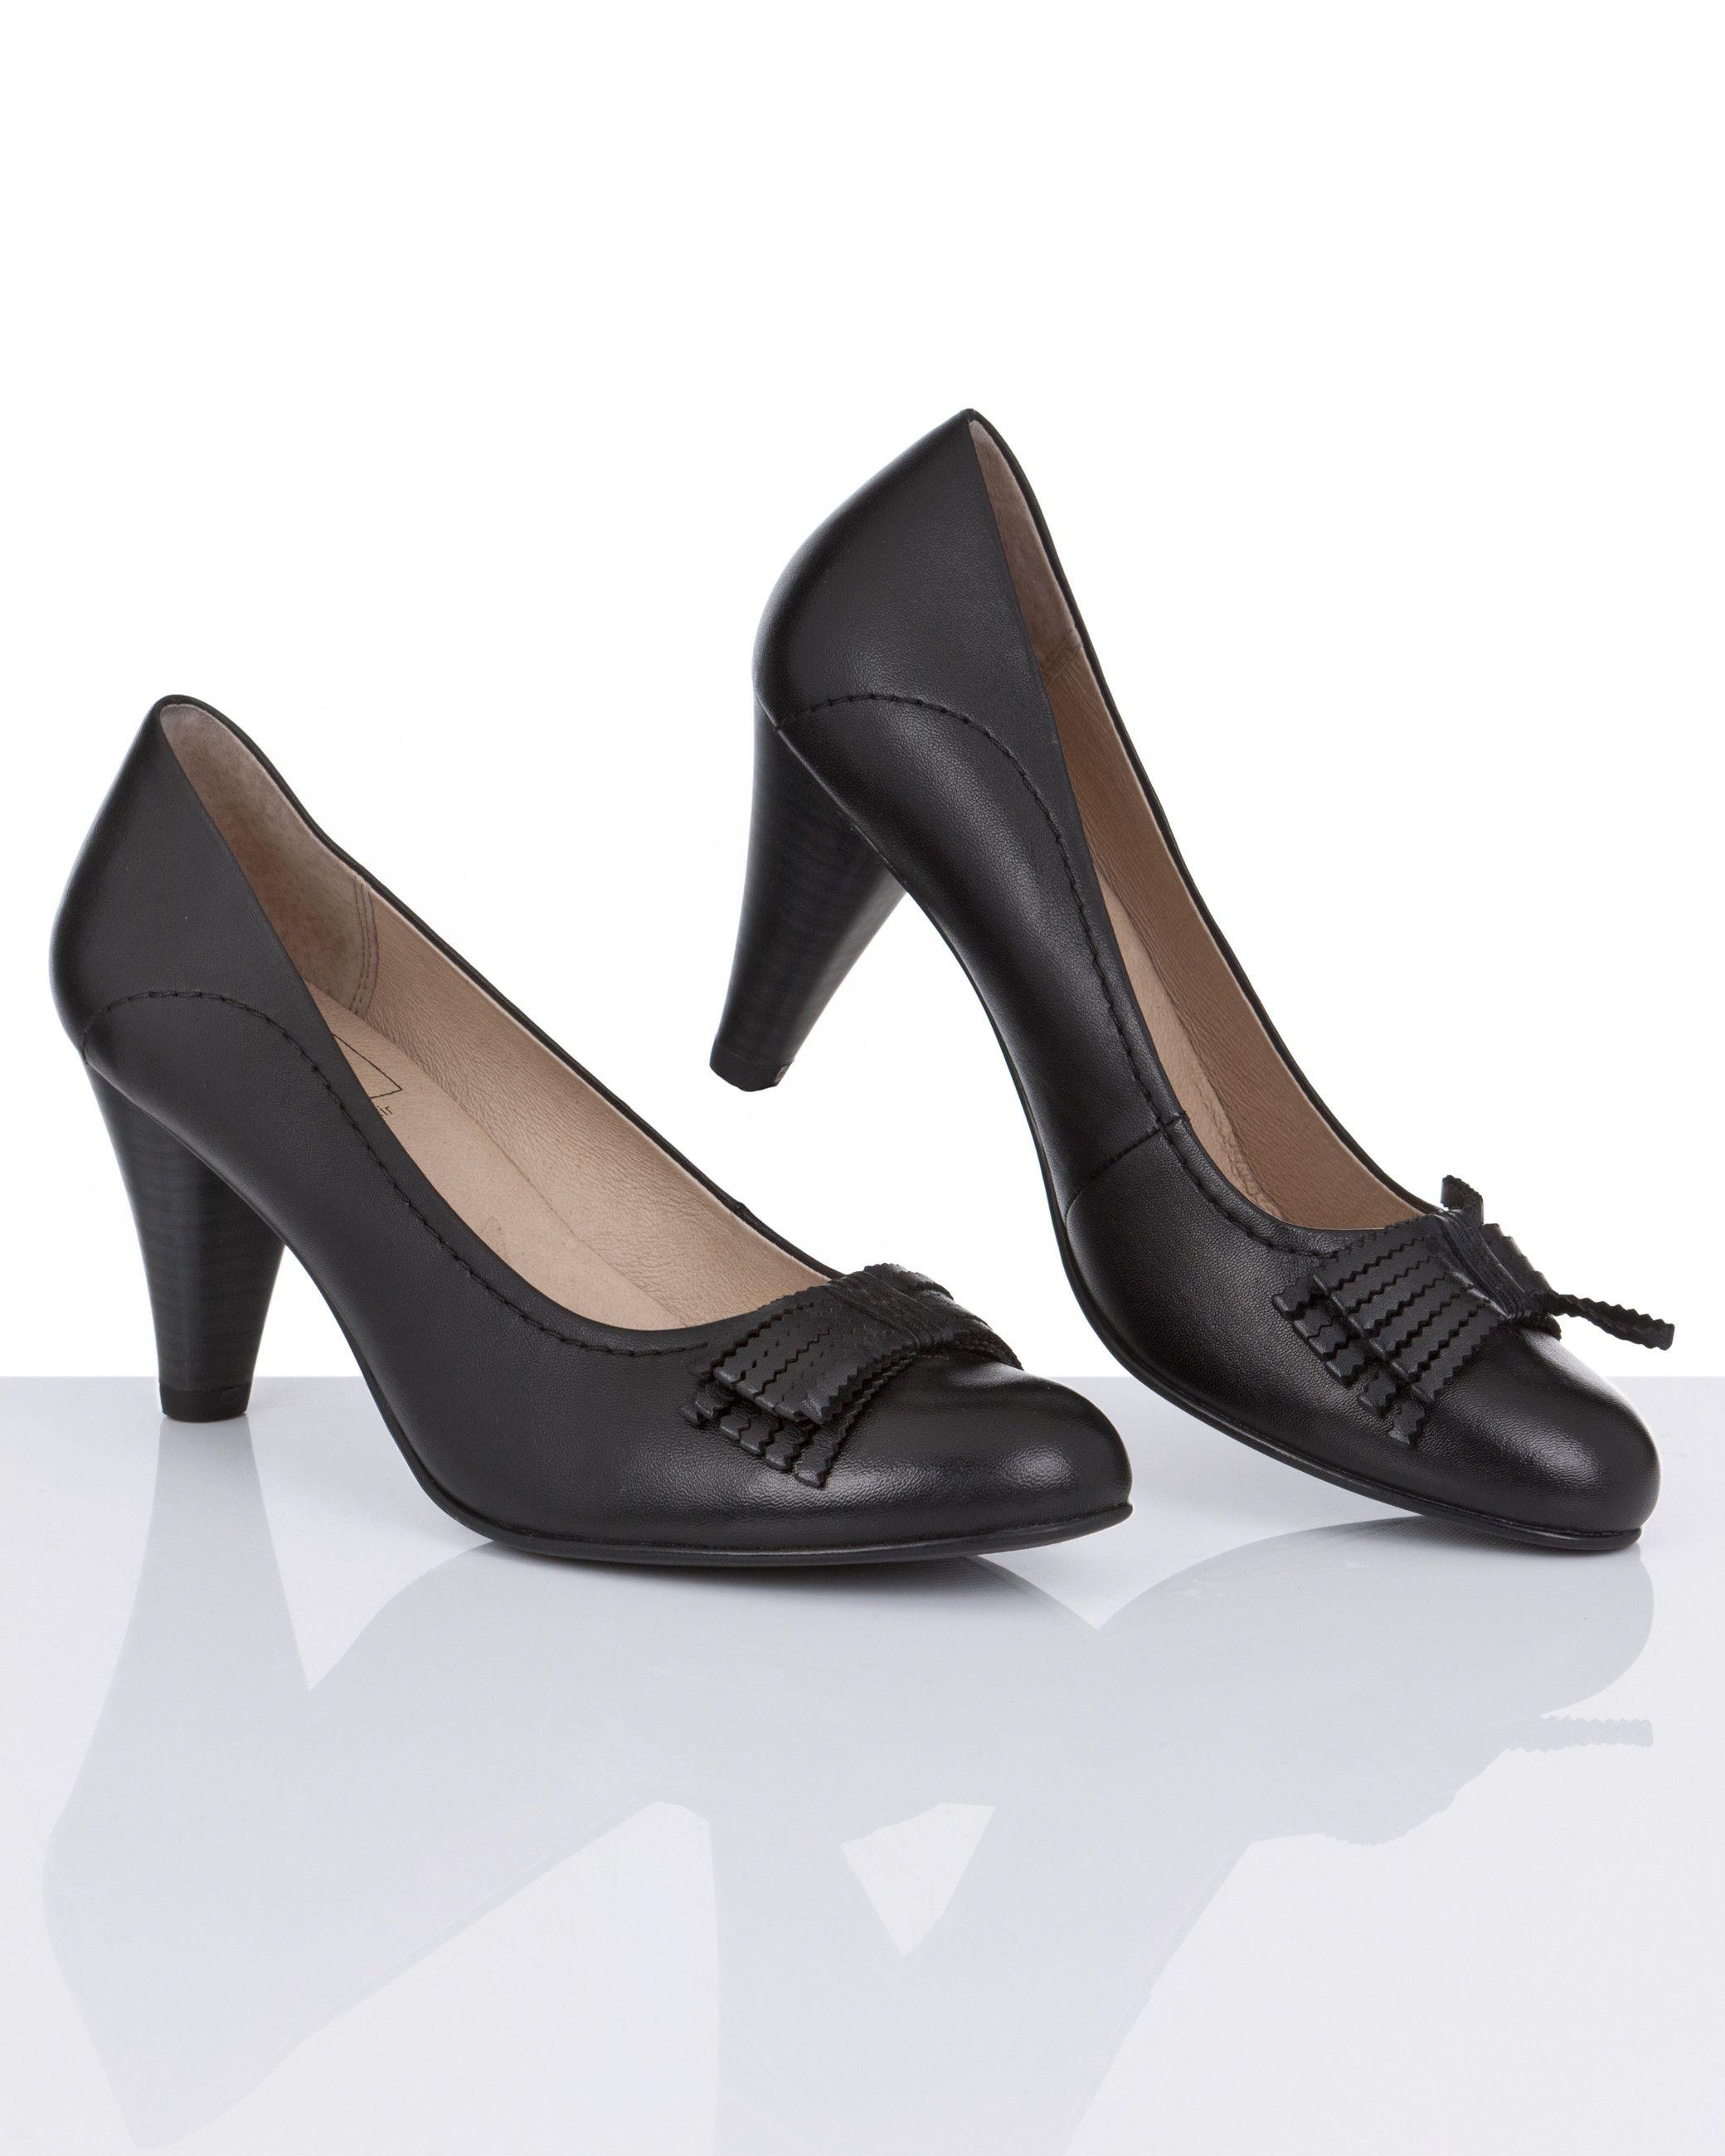 Caprice | Women's Fashion | Pumps | #HSE24 #style